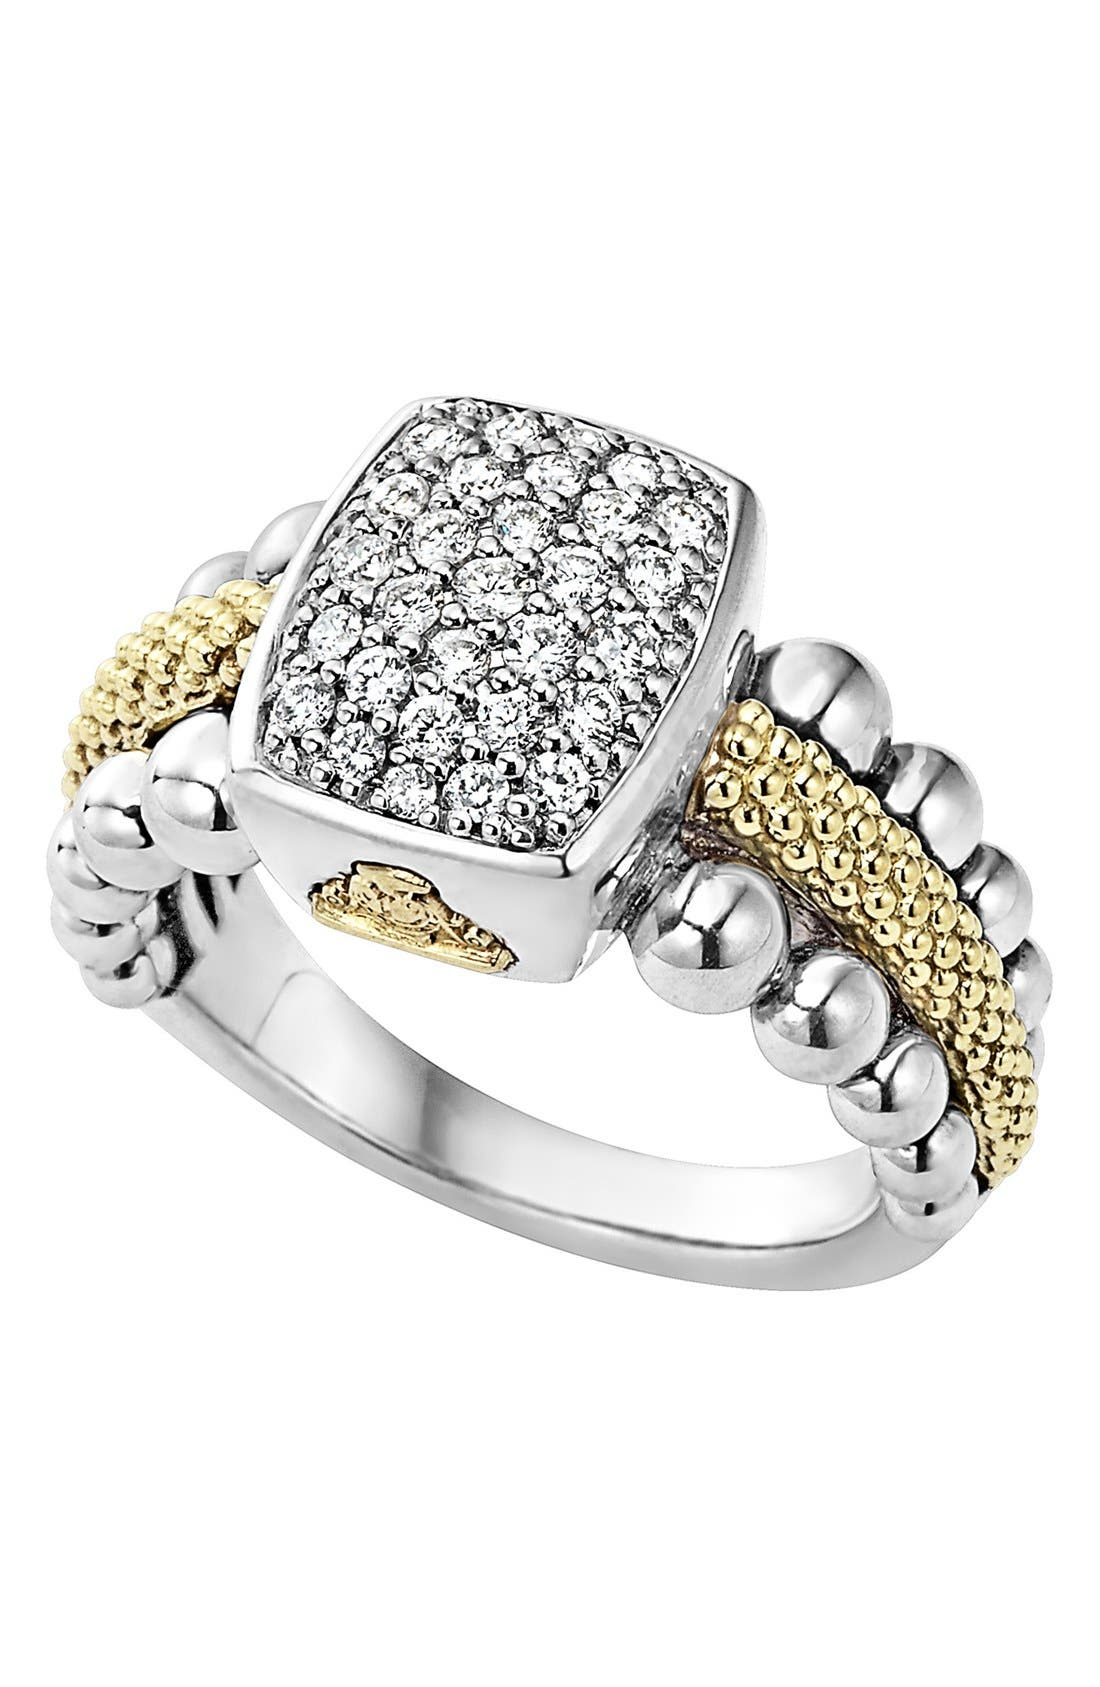 Diamond Caviar Square Ring,                             Main thumbnail 1, color,                             Silver/ Gold